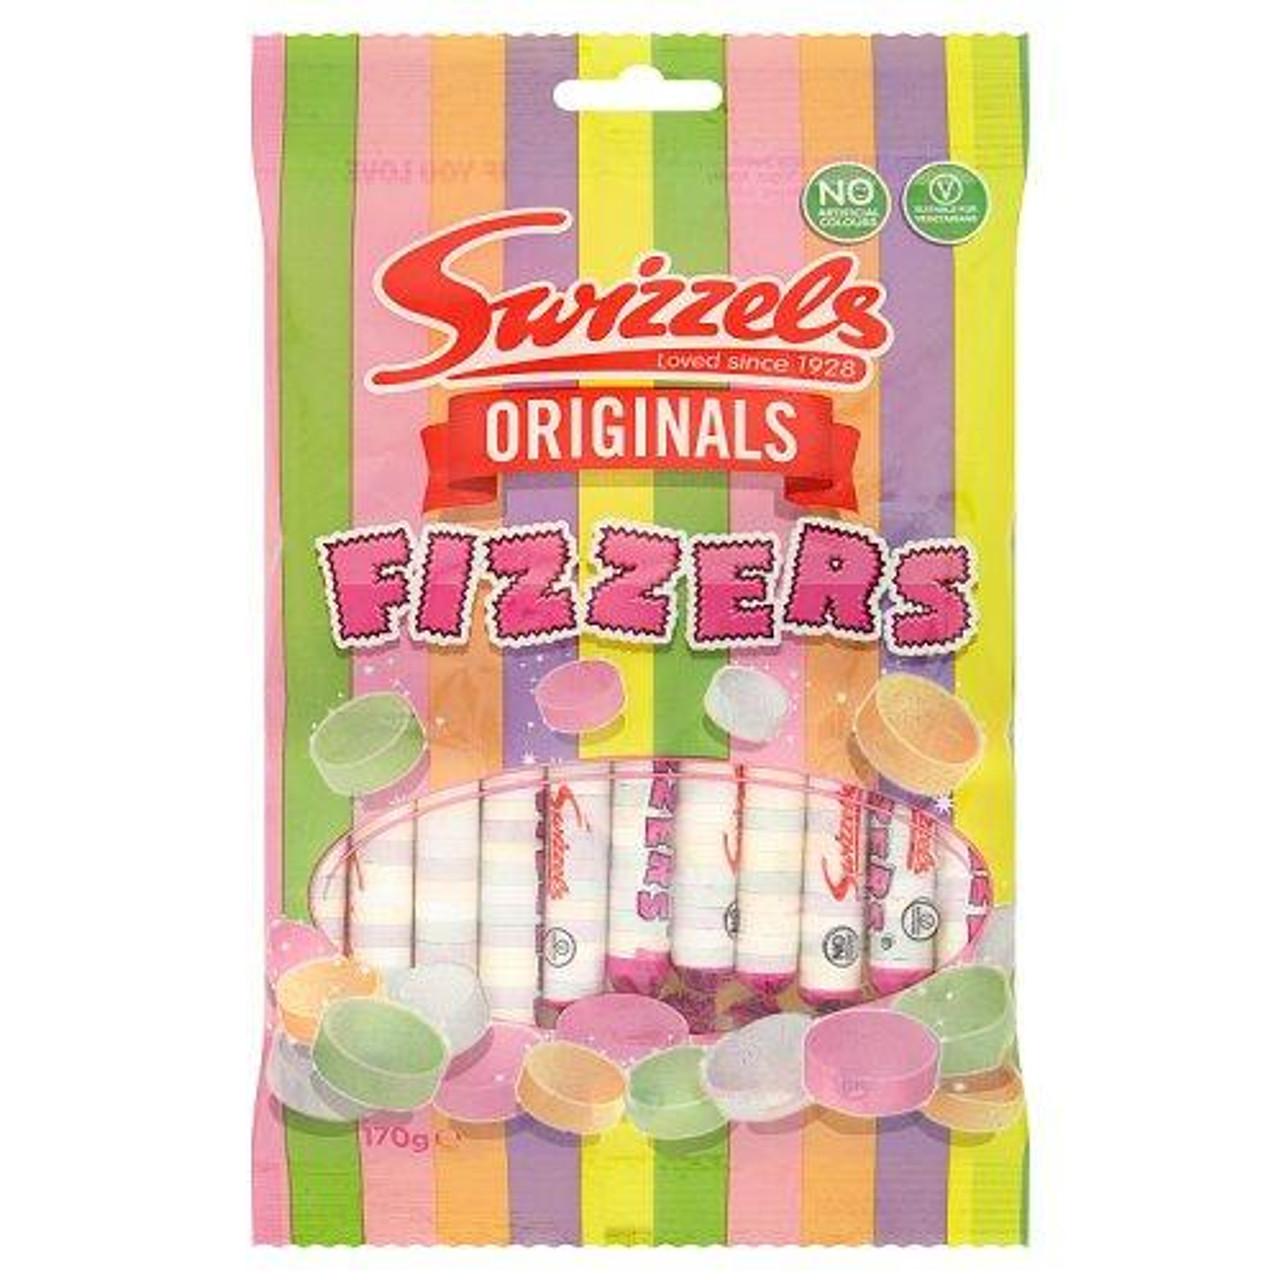 Swizzels - Originals Fizzers, 170g